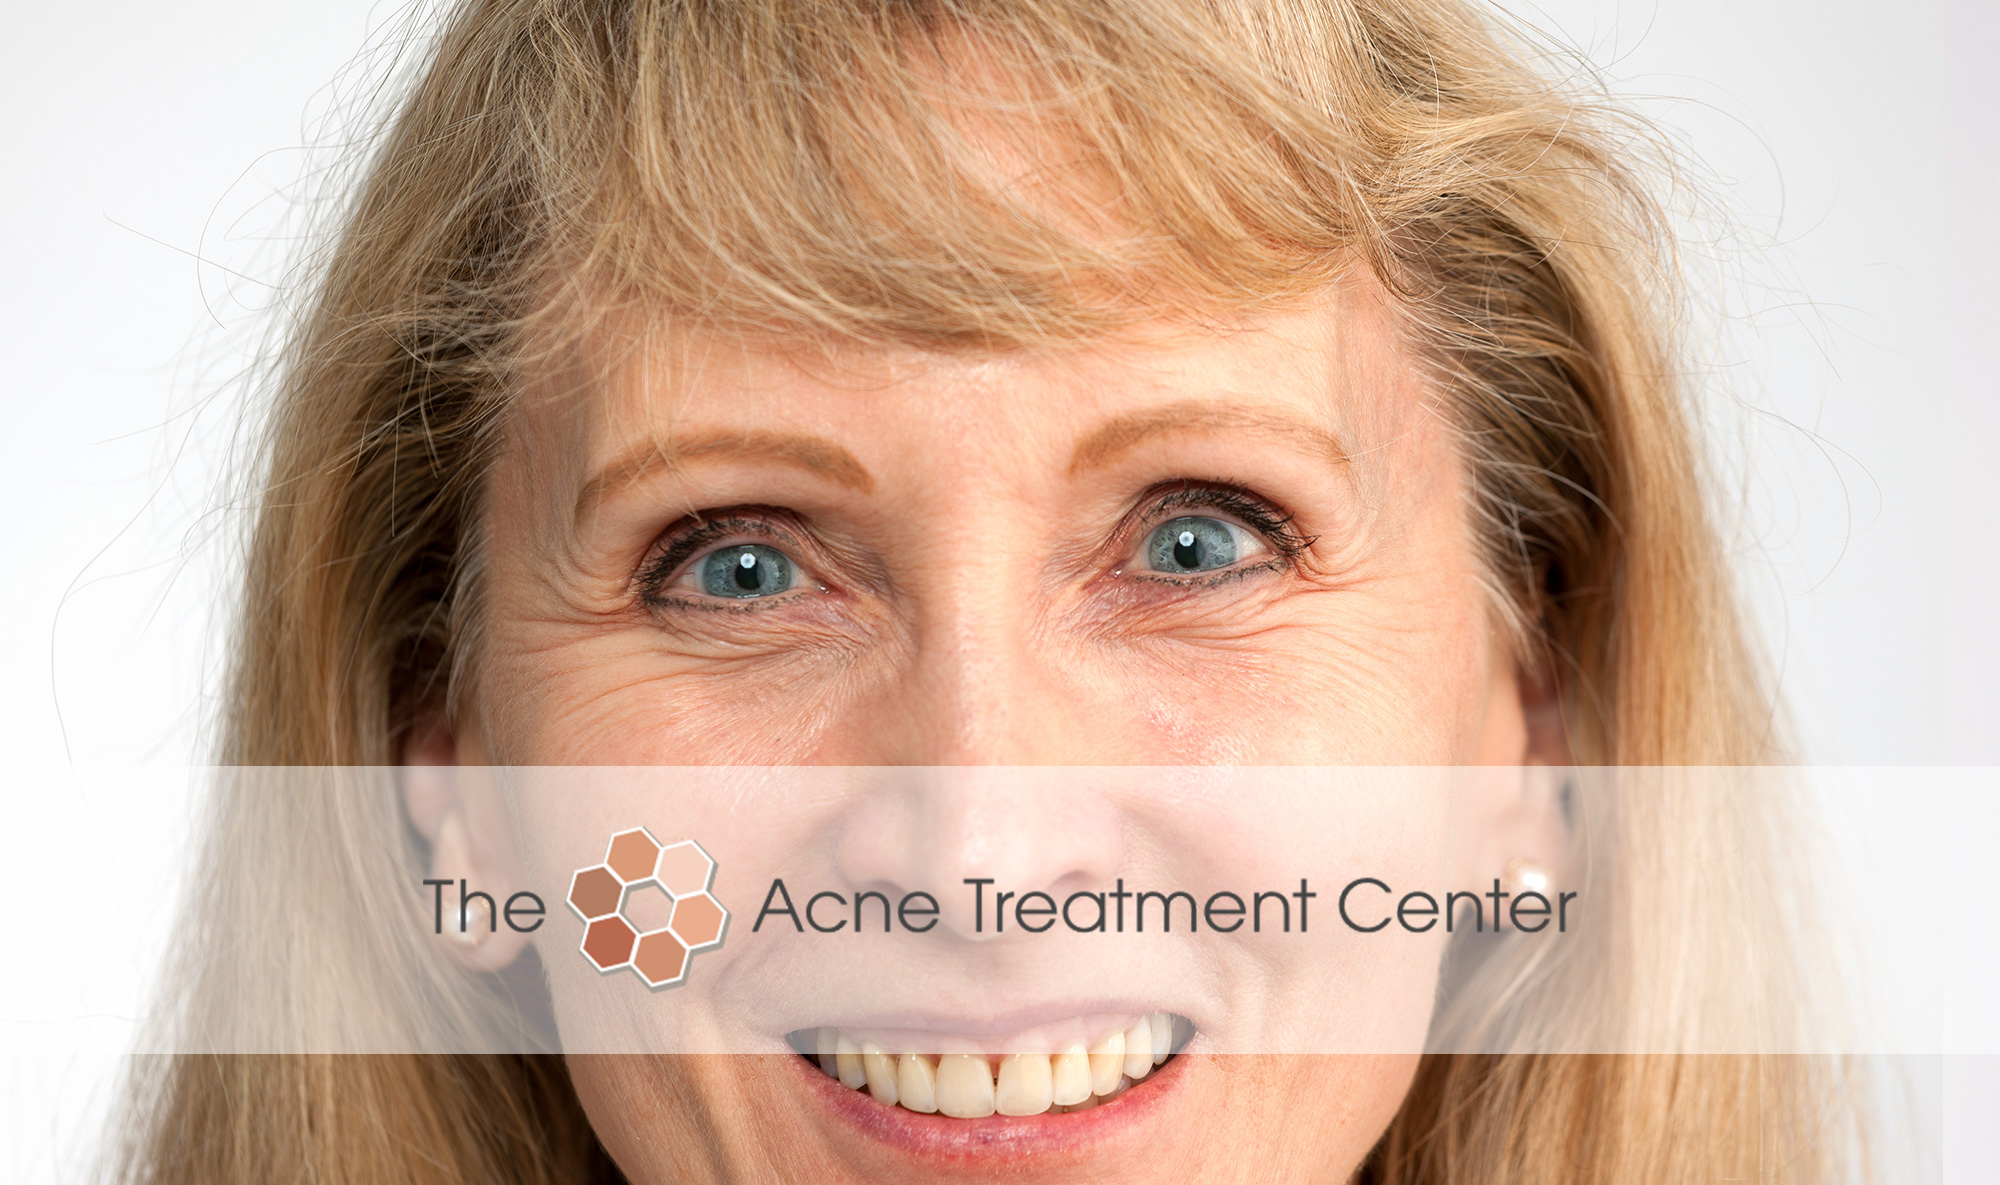 Acne Treatment Center - Before Botox Treatment